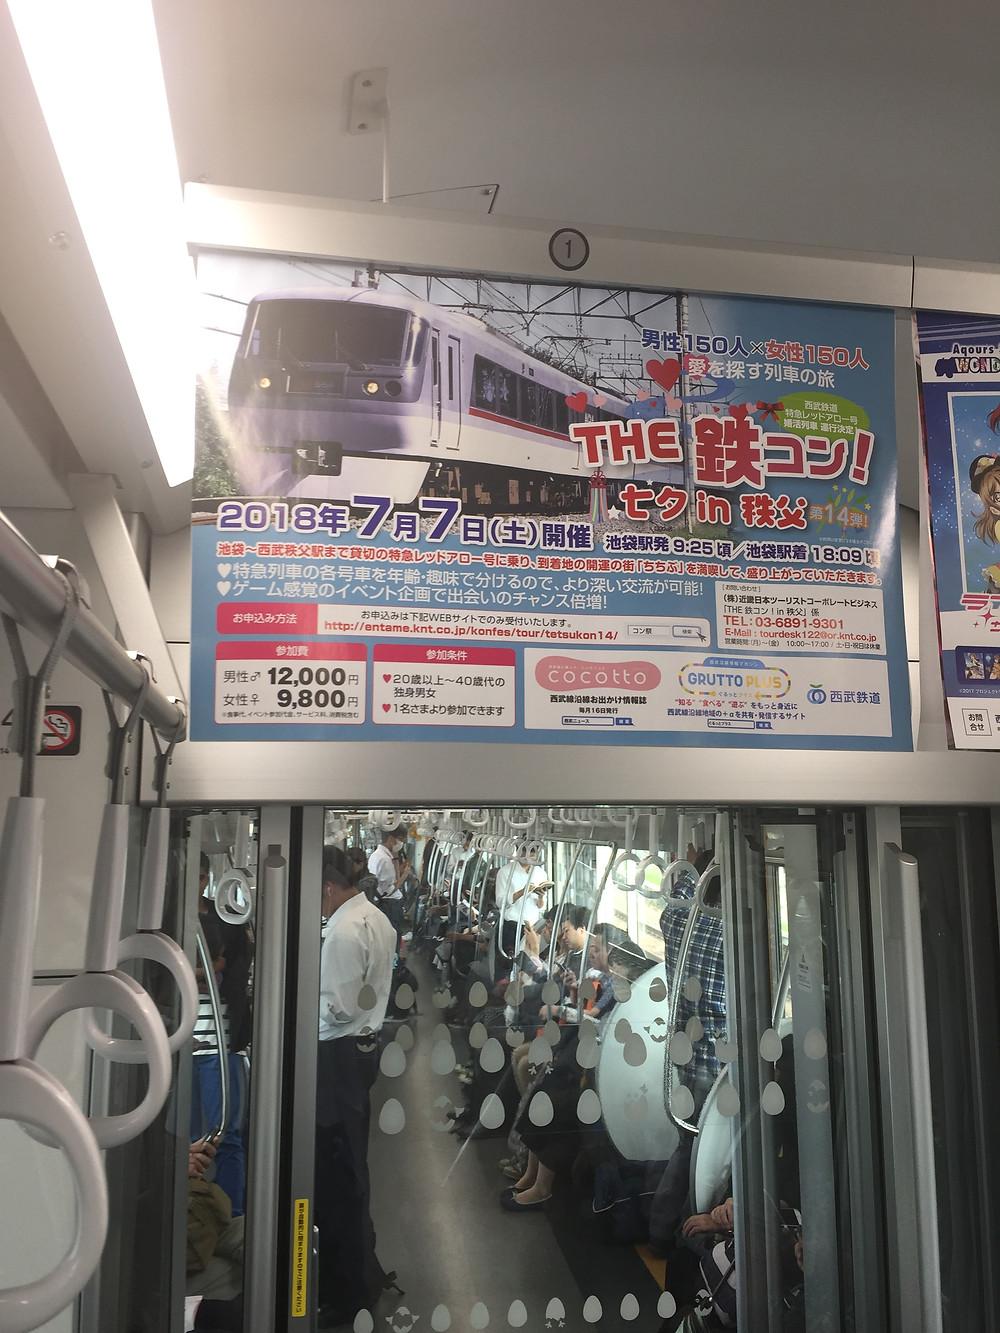 Advertisement inside the train